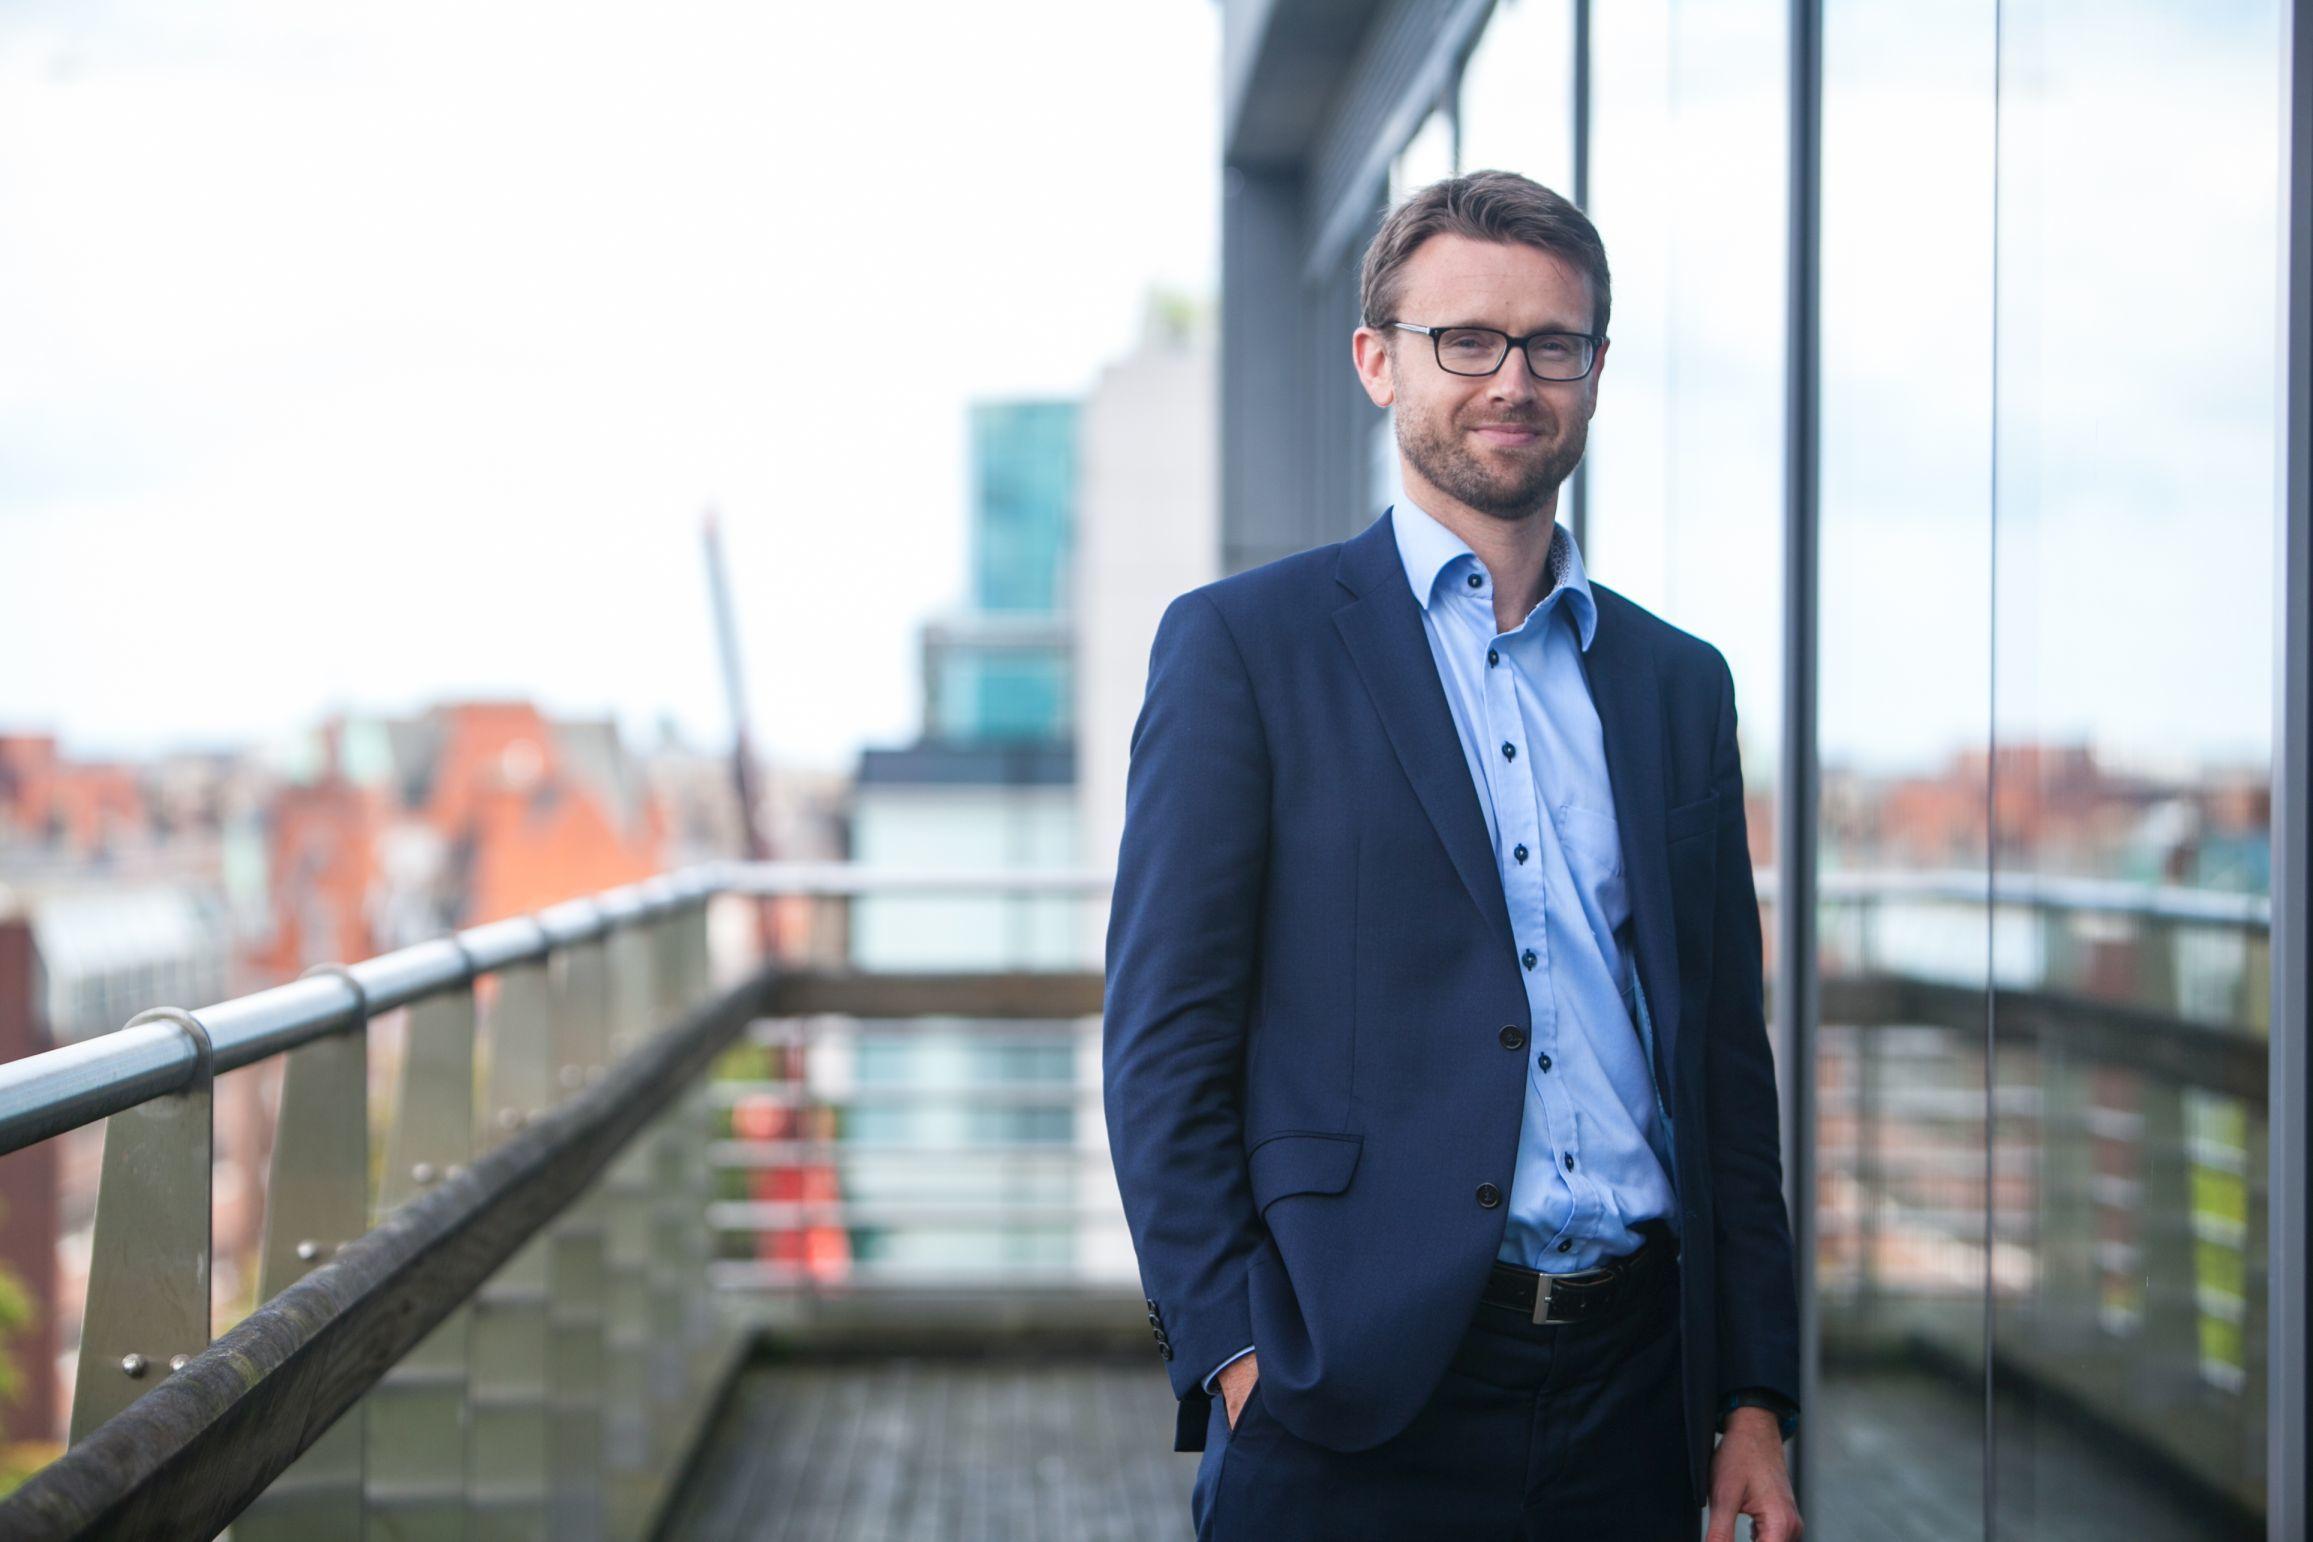 Irish fintech start-ups urged to apply for Barclays Accelerator